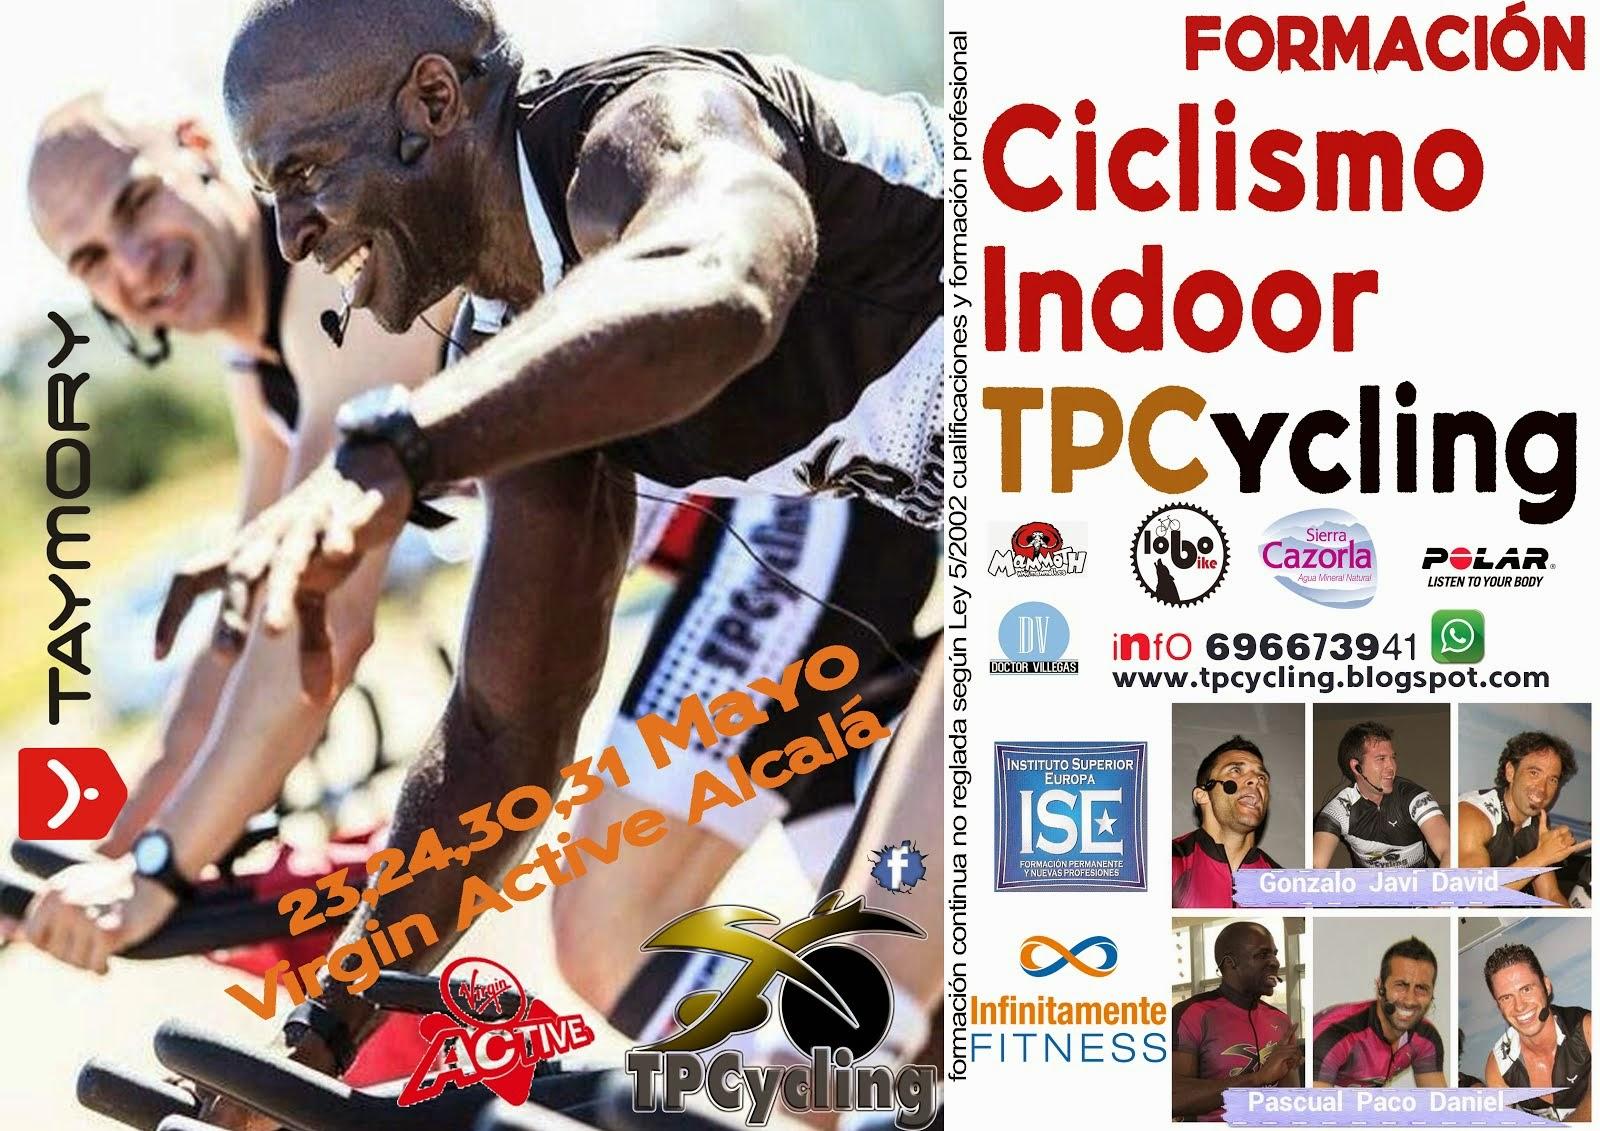 XXXI Formación TPCycling